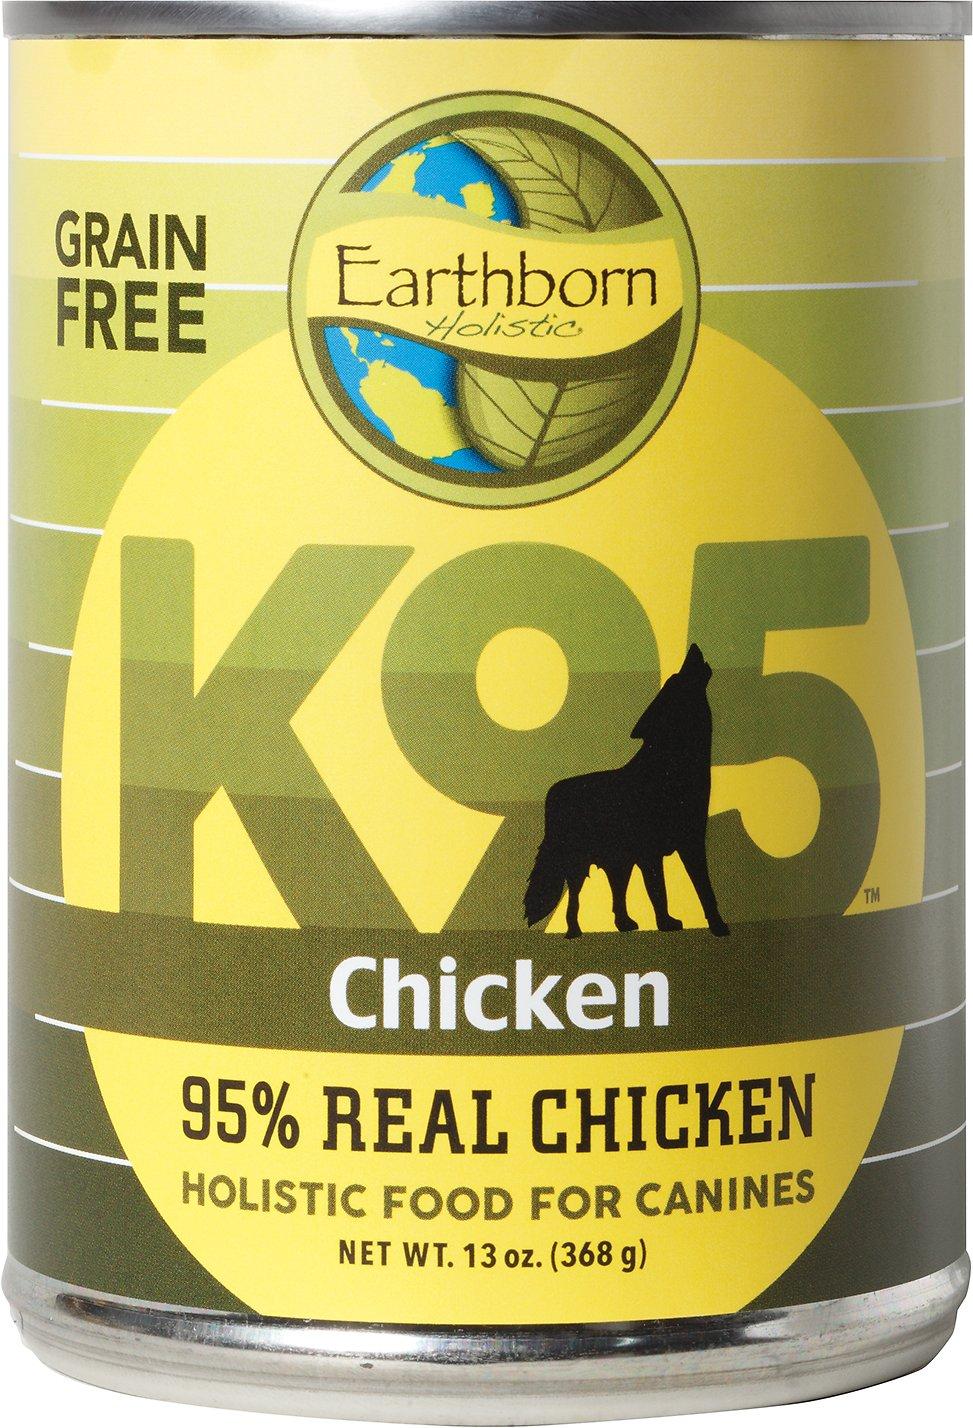 Earthborn Holistic K95 Chicken Recipe Grain-Free Canned Dog Food, 13-oz, case of 12